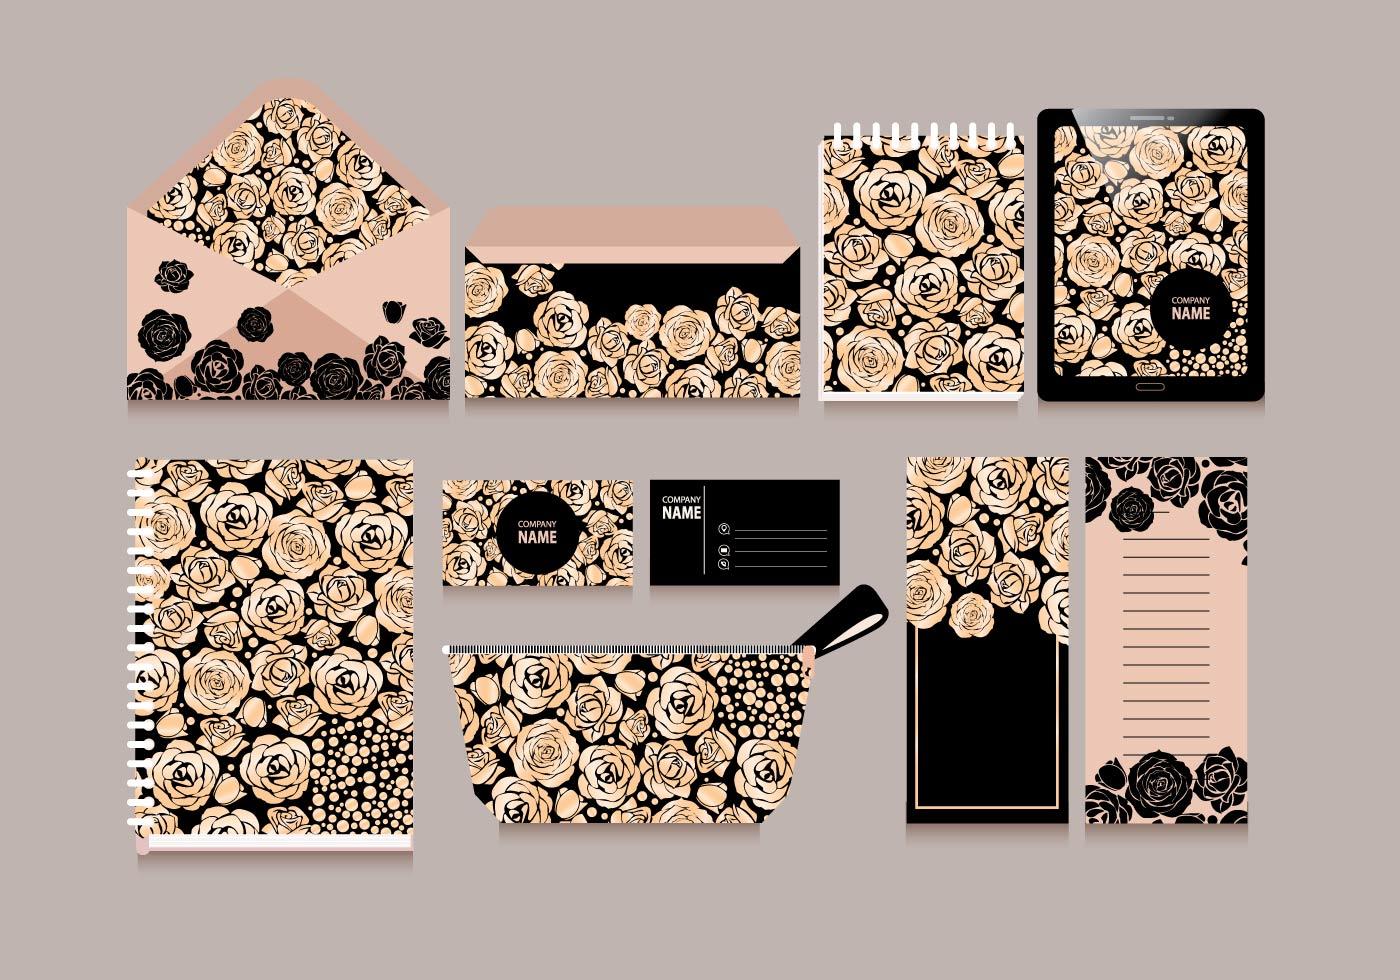 rose border free vector art 5963 free downloads